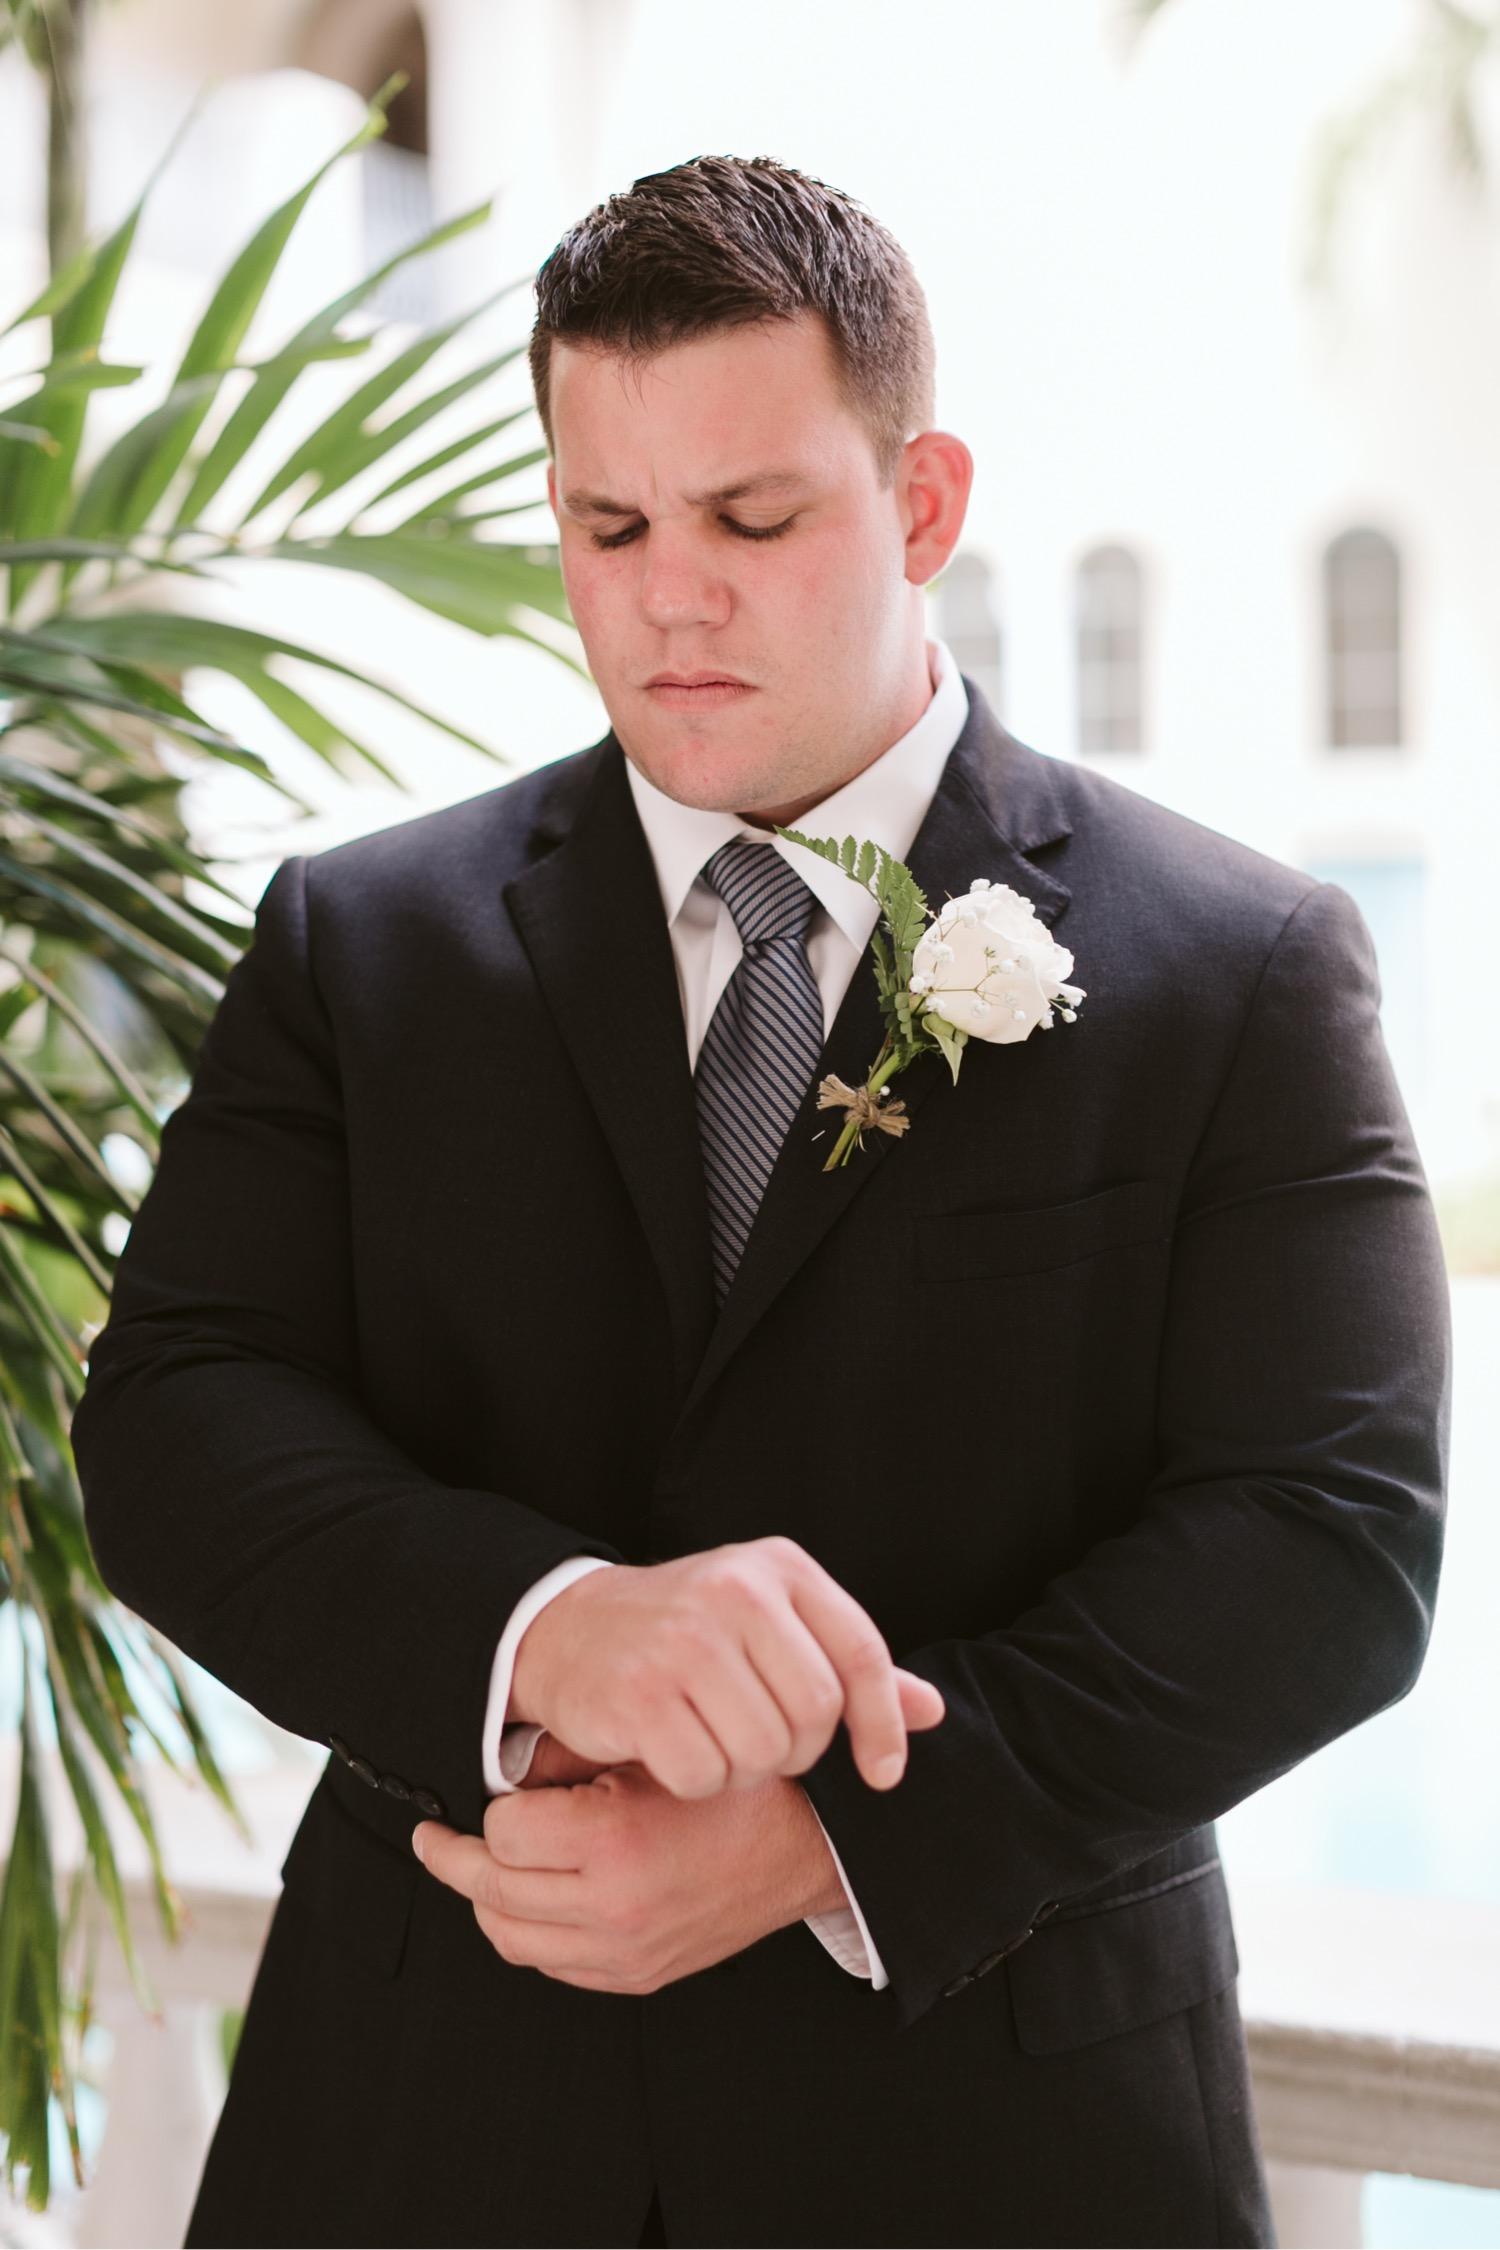 005_Brayden-Julianne-Wedding-62_at_Cafe_Julia_Hawaii_getting_Groom_ready.jpg